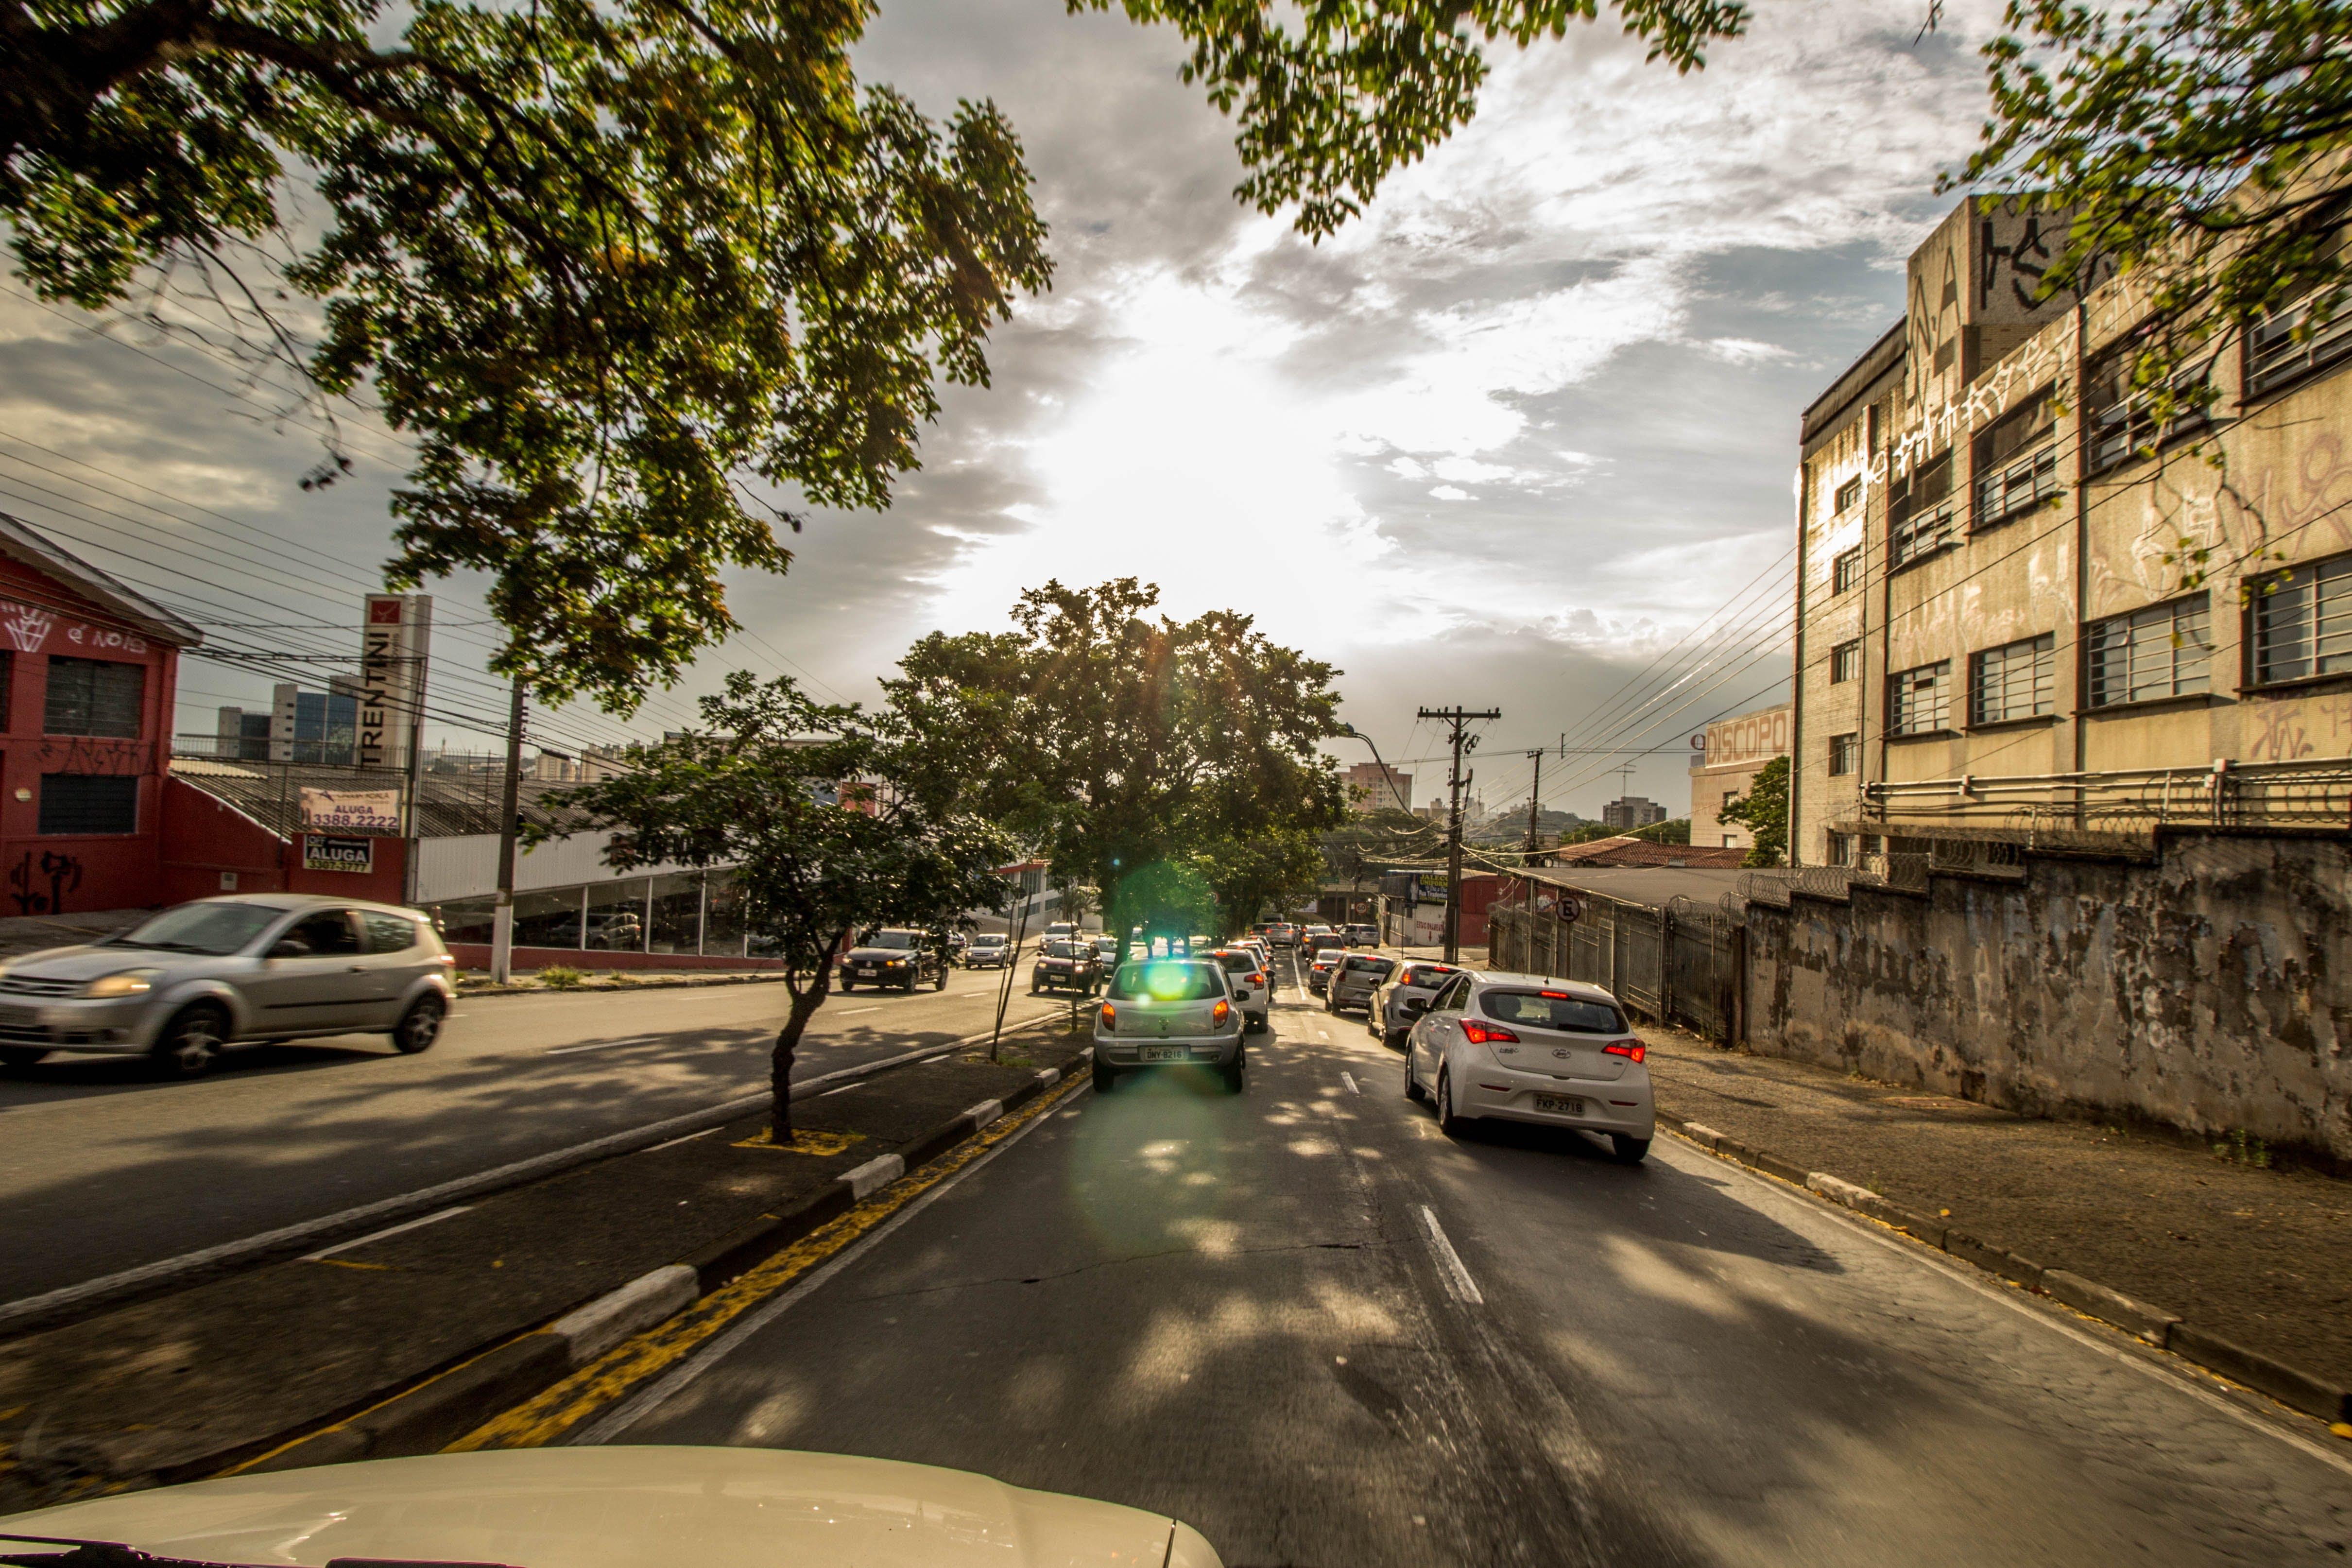 asfalto, automóveis, carros